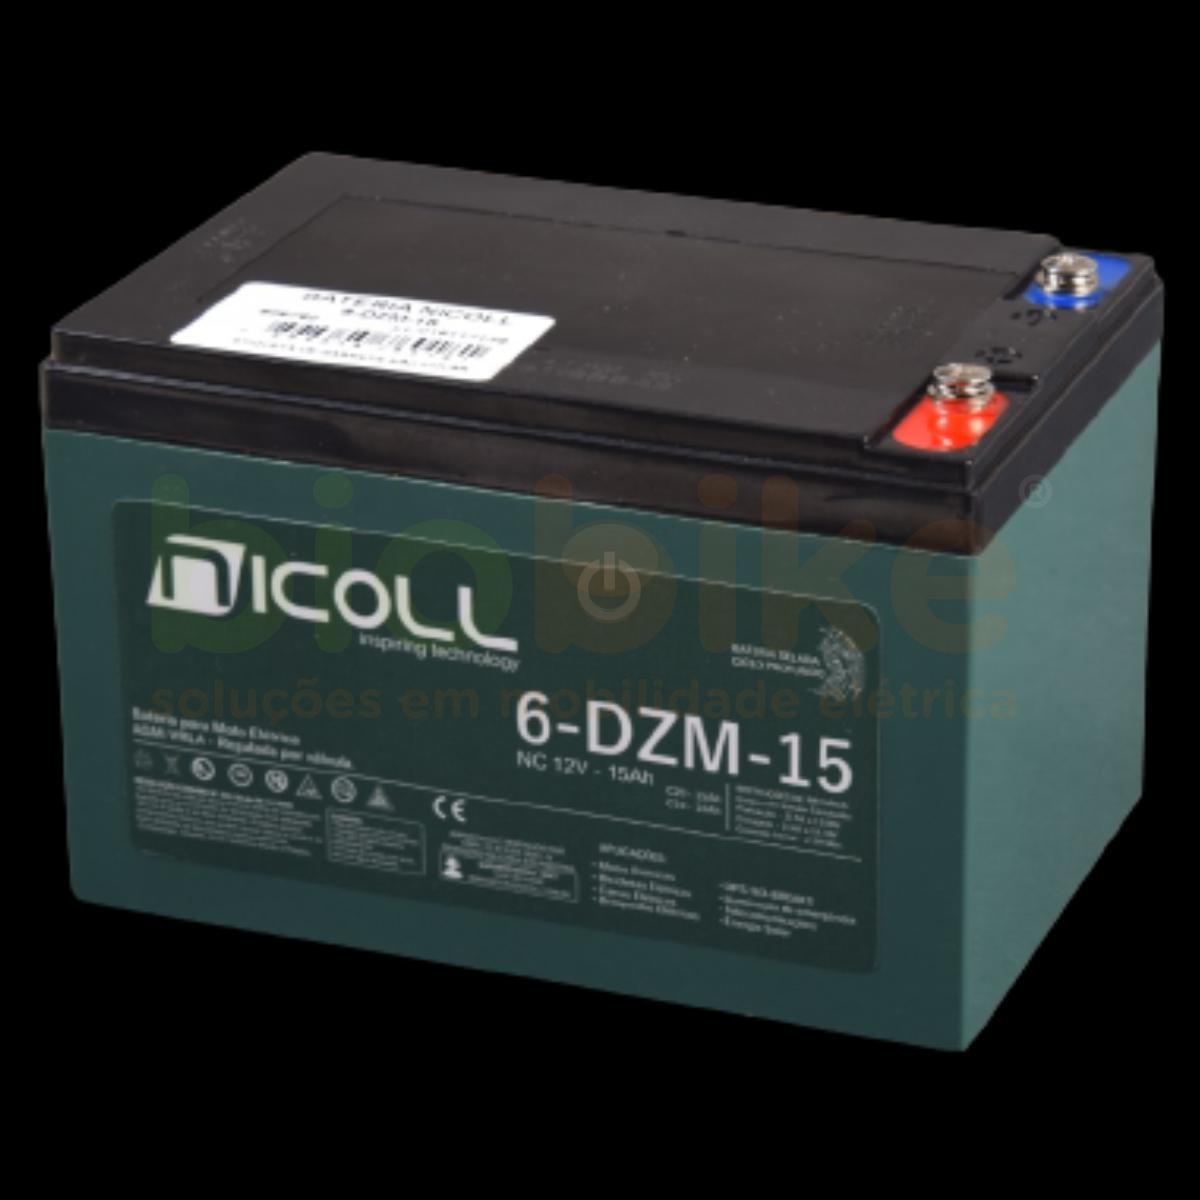 Bateria de Chumbo Ácido, Nicoll, VRLA (6-DZM-15), 12v 15ah